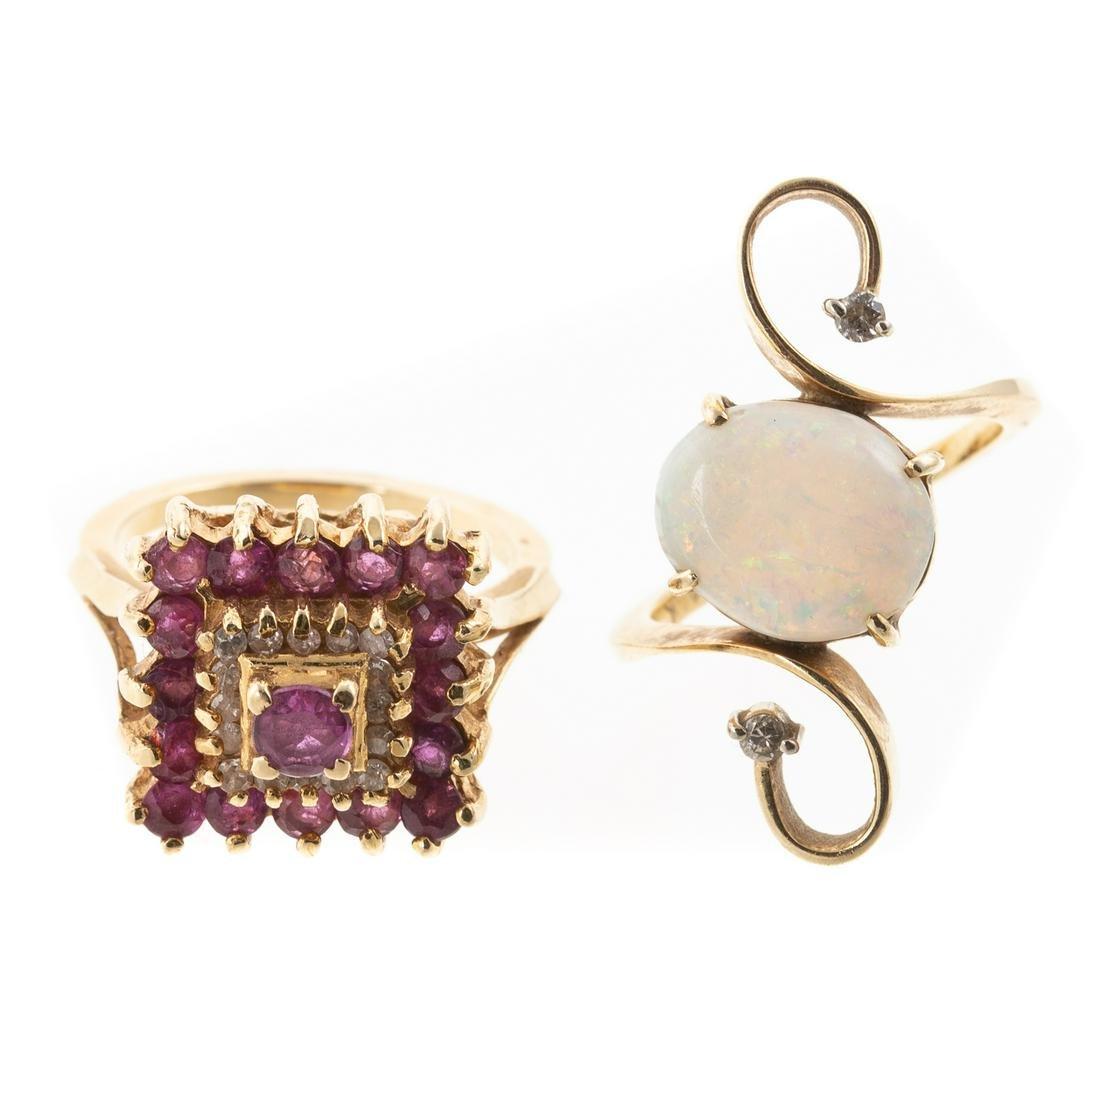 A Ruby & Diamond Ring & Opal Ring in 14K